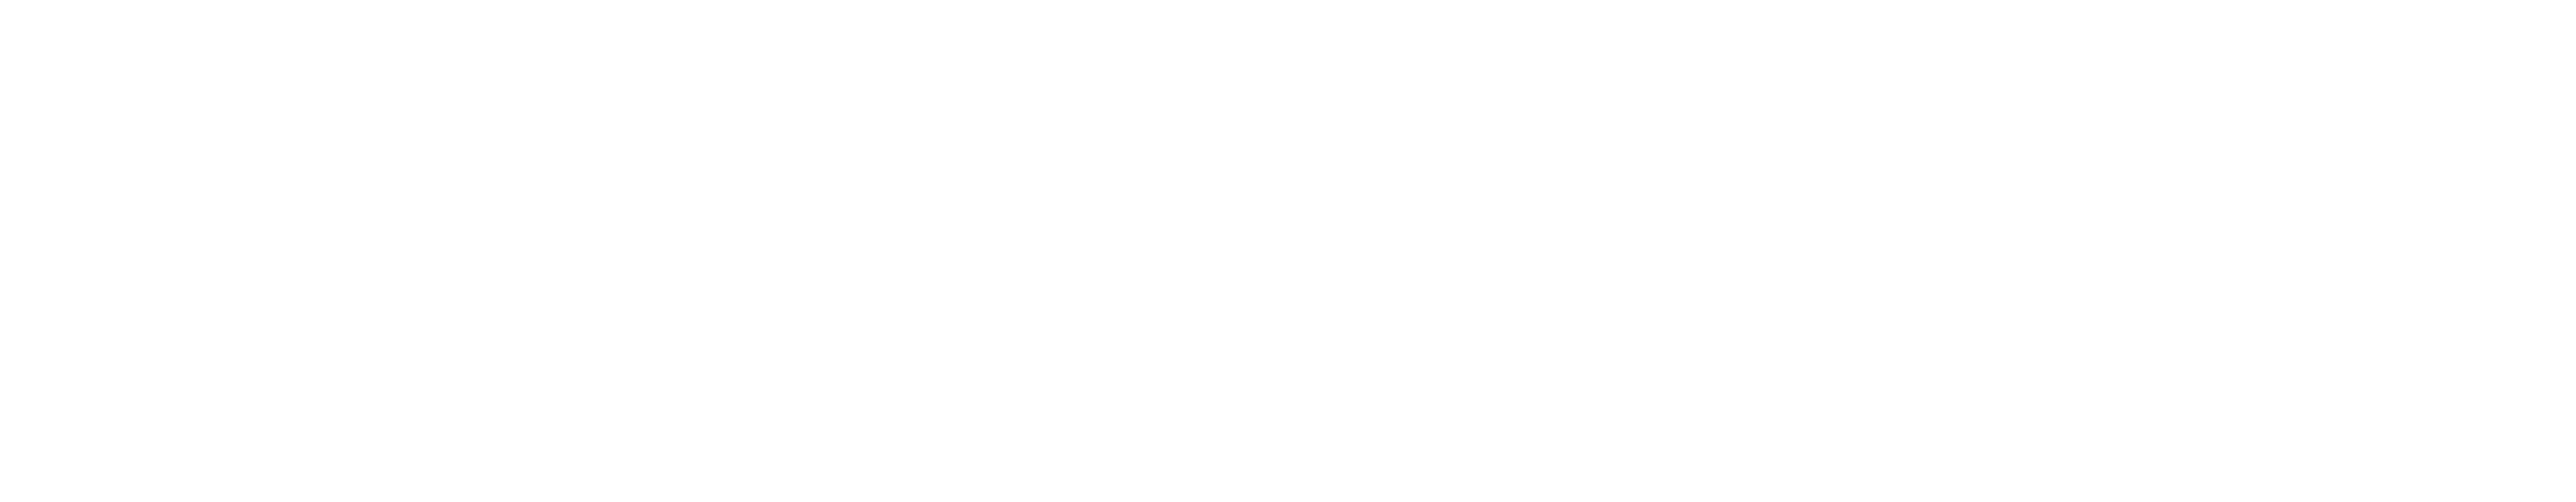 Altatek